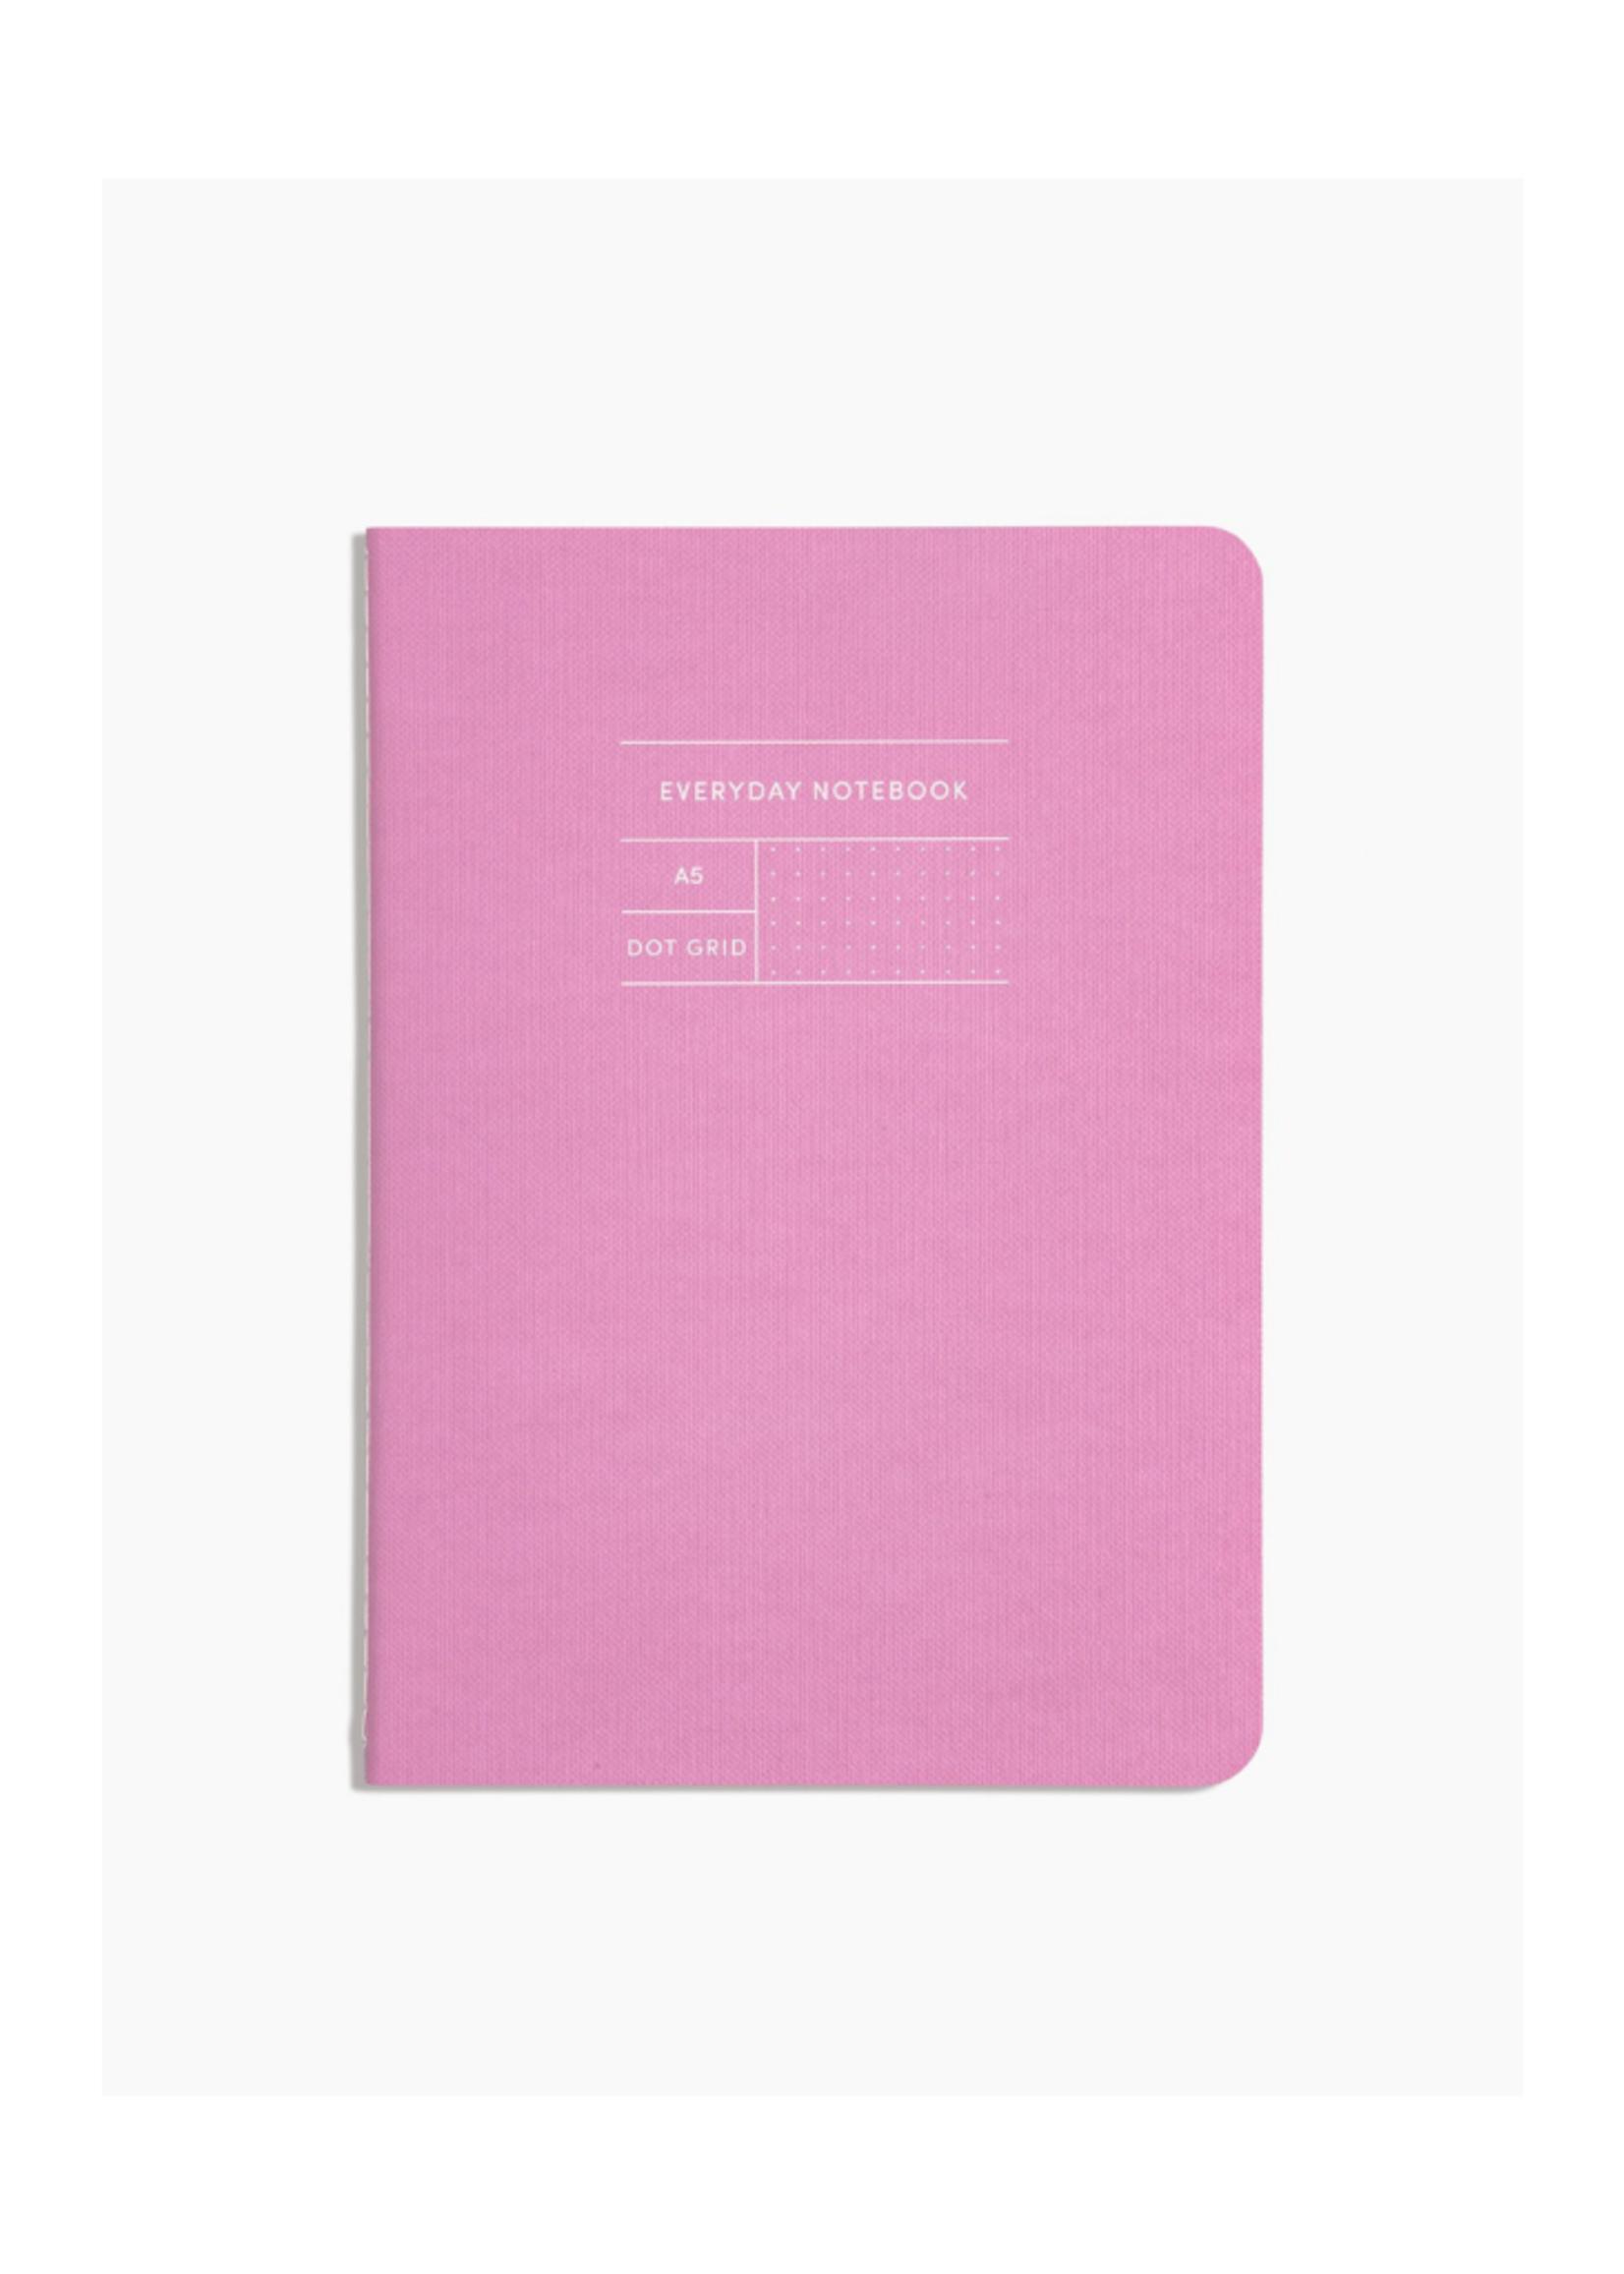 Poketo Everyday Notebook Dotted